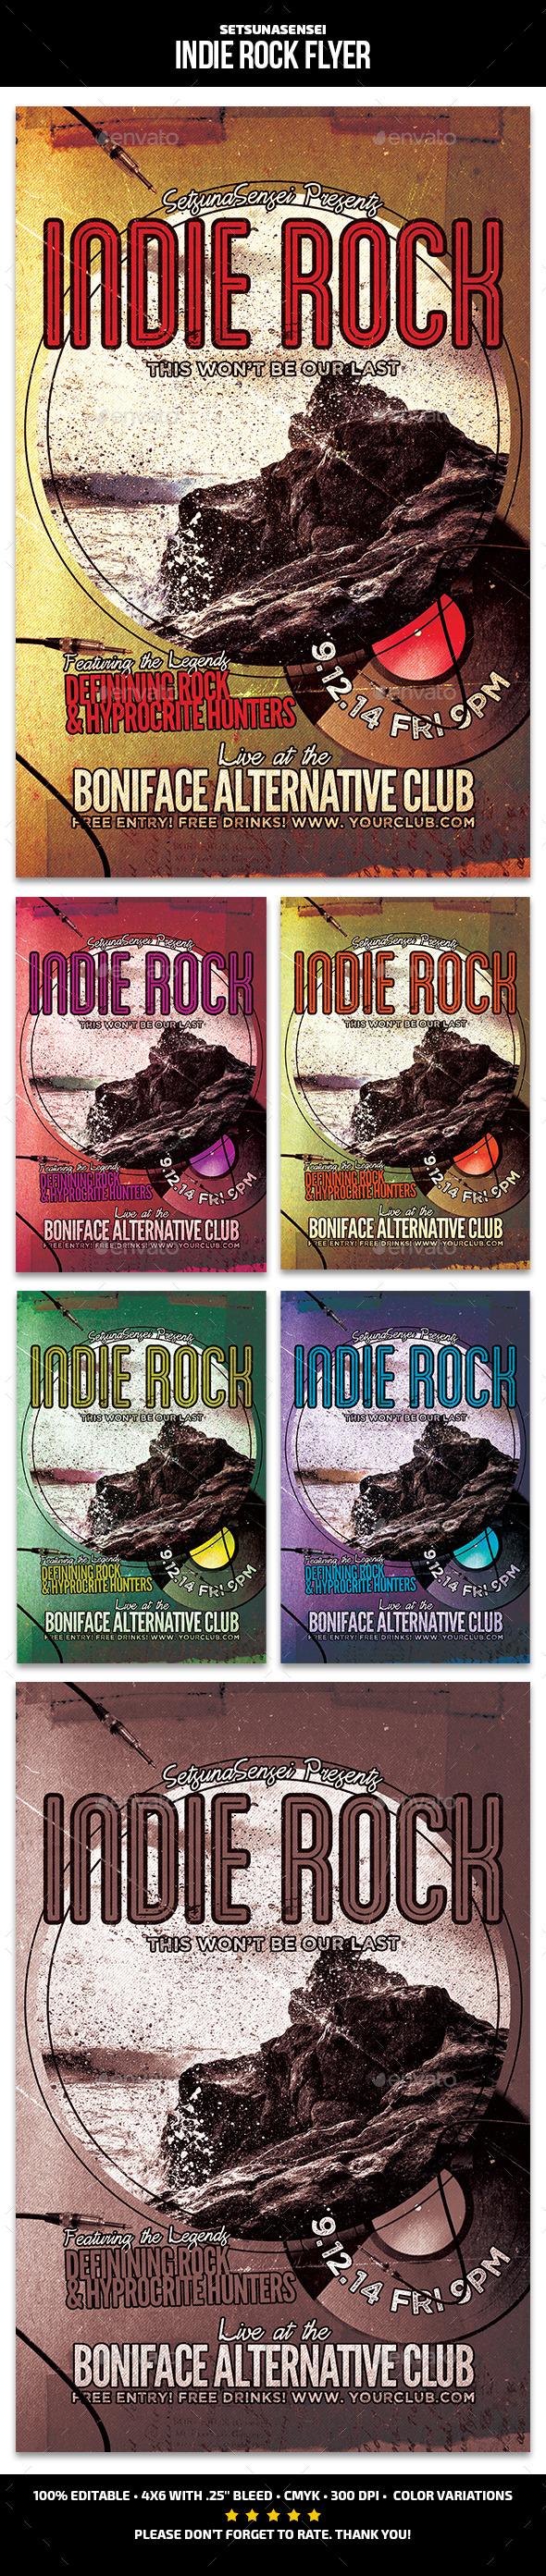 GraphicRiver Indie Rock Flyer 10930050